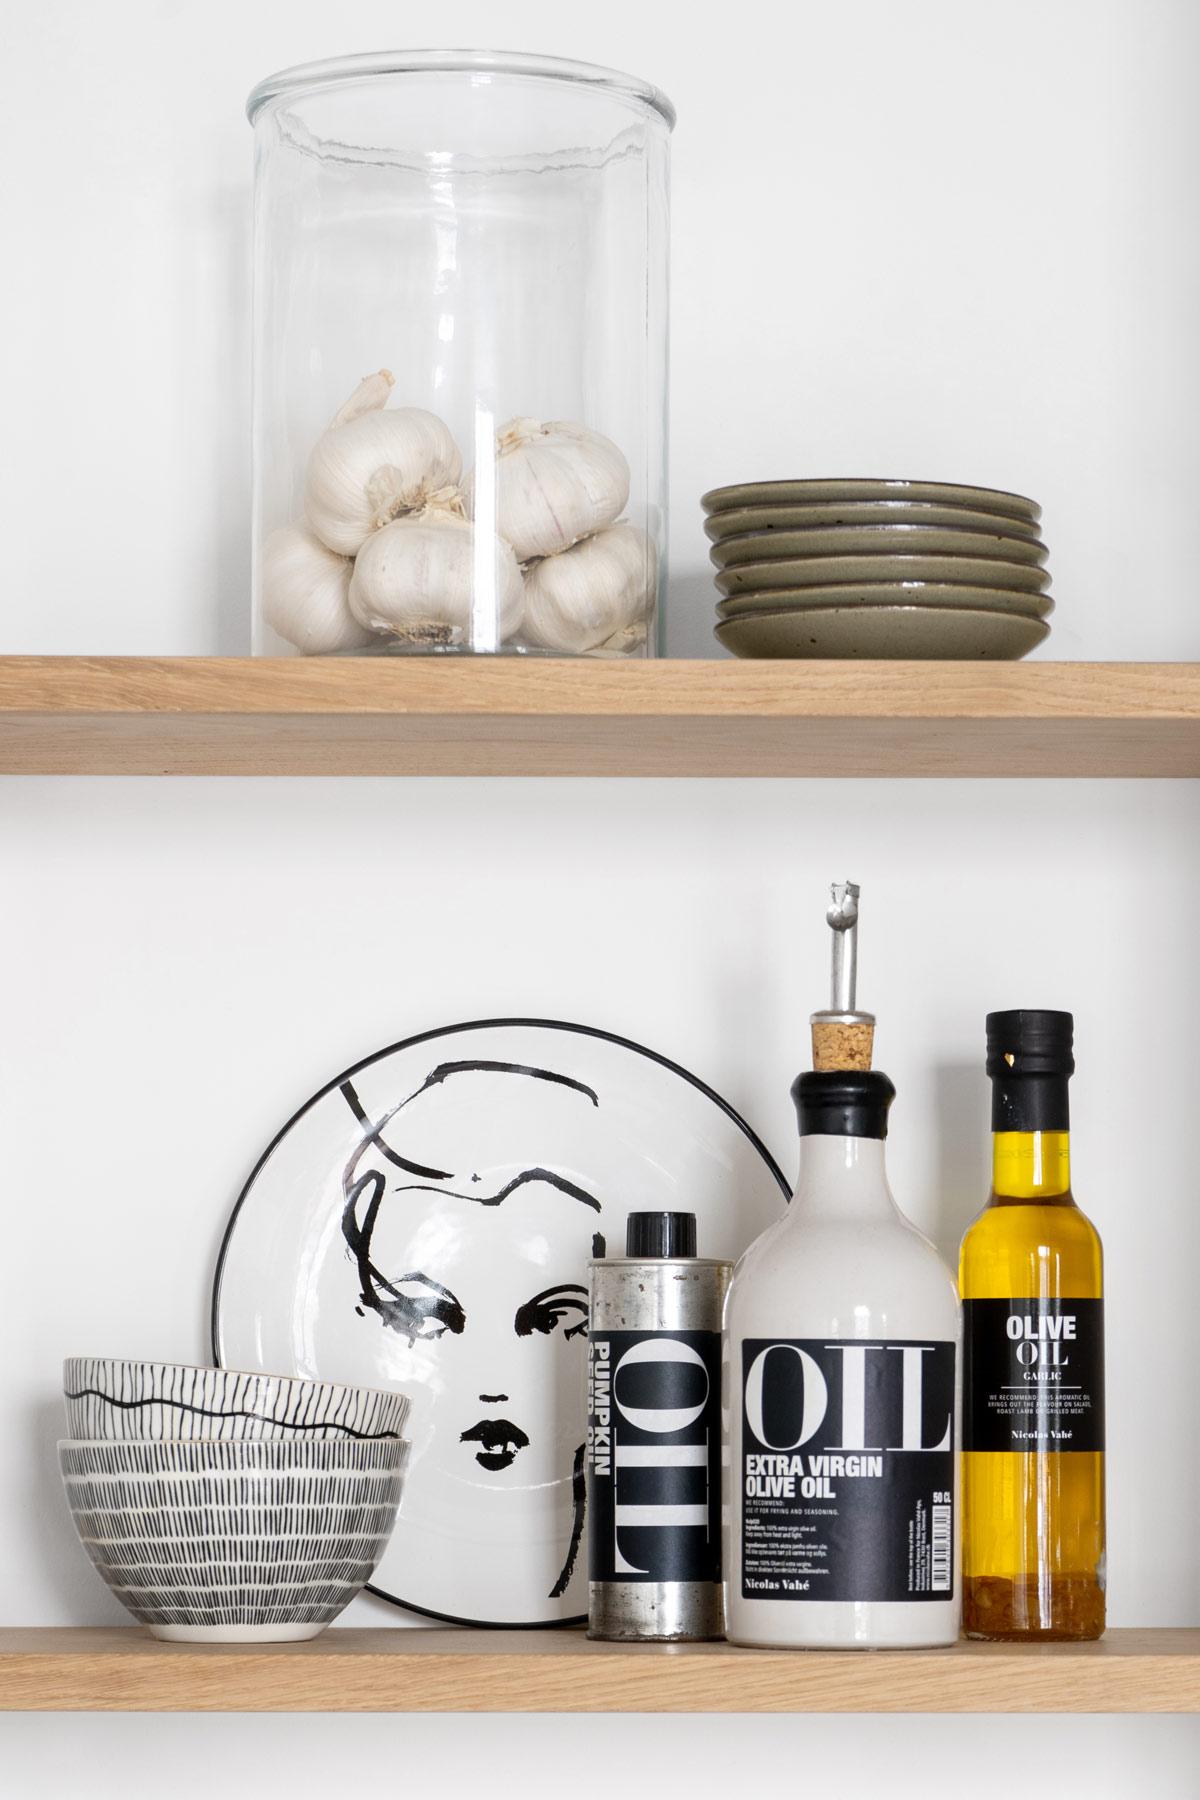 Afzuigkap ombouw DIY keuken - Tanja van Hoogdalem